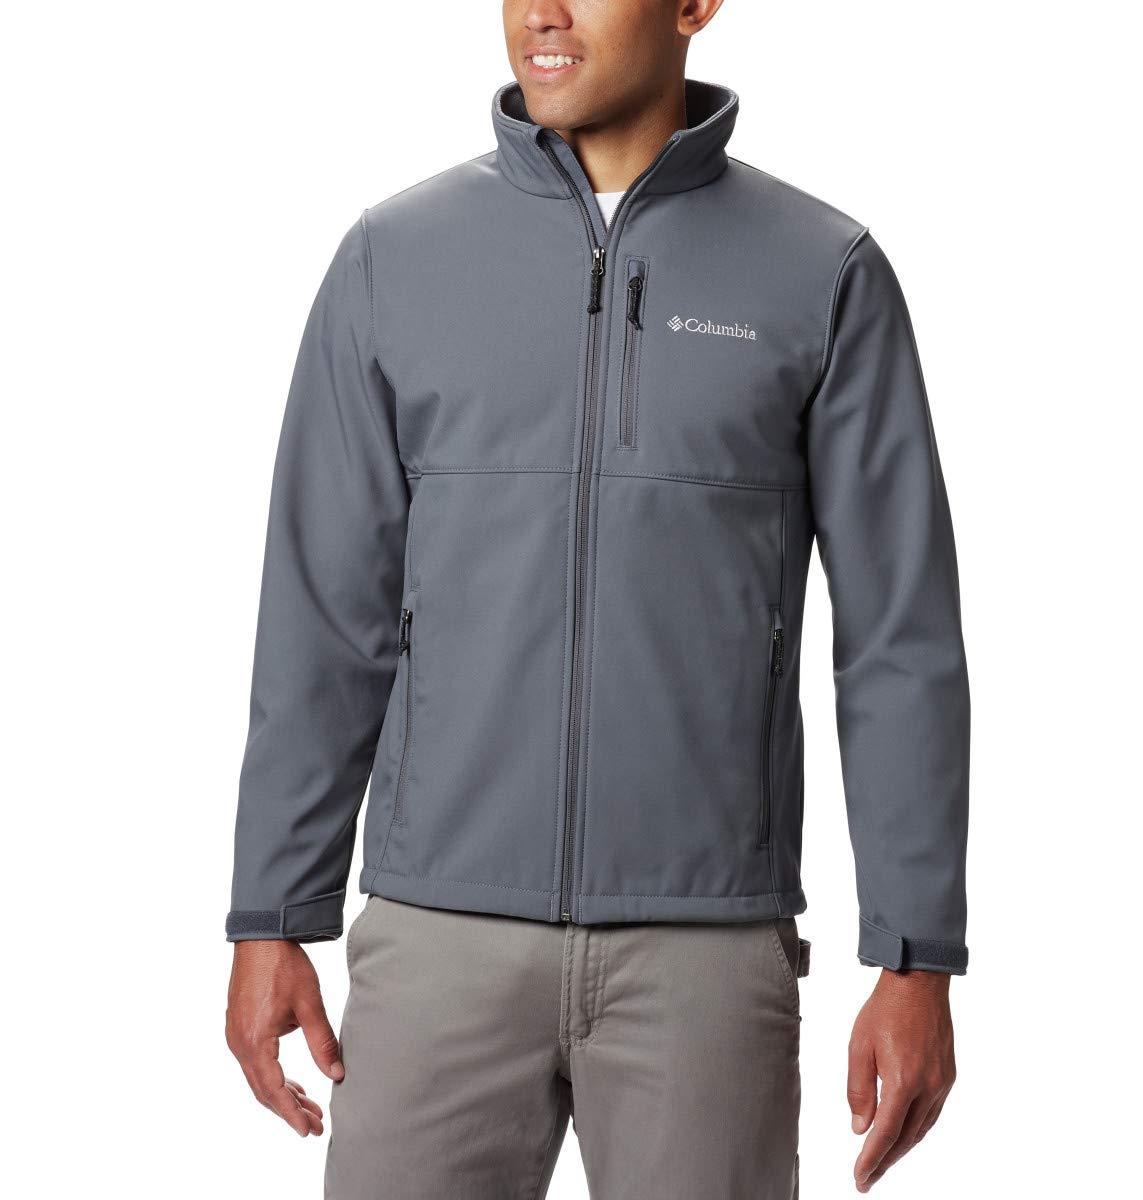 Columbia Men's Ascender Softshell Jacket, Water